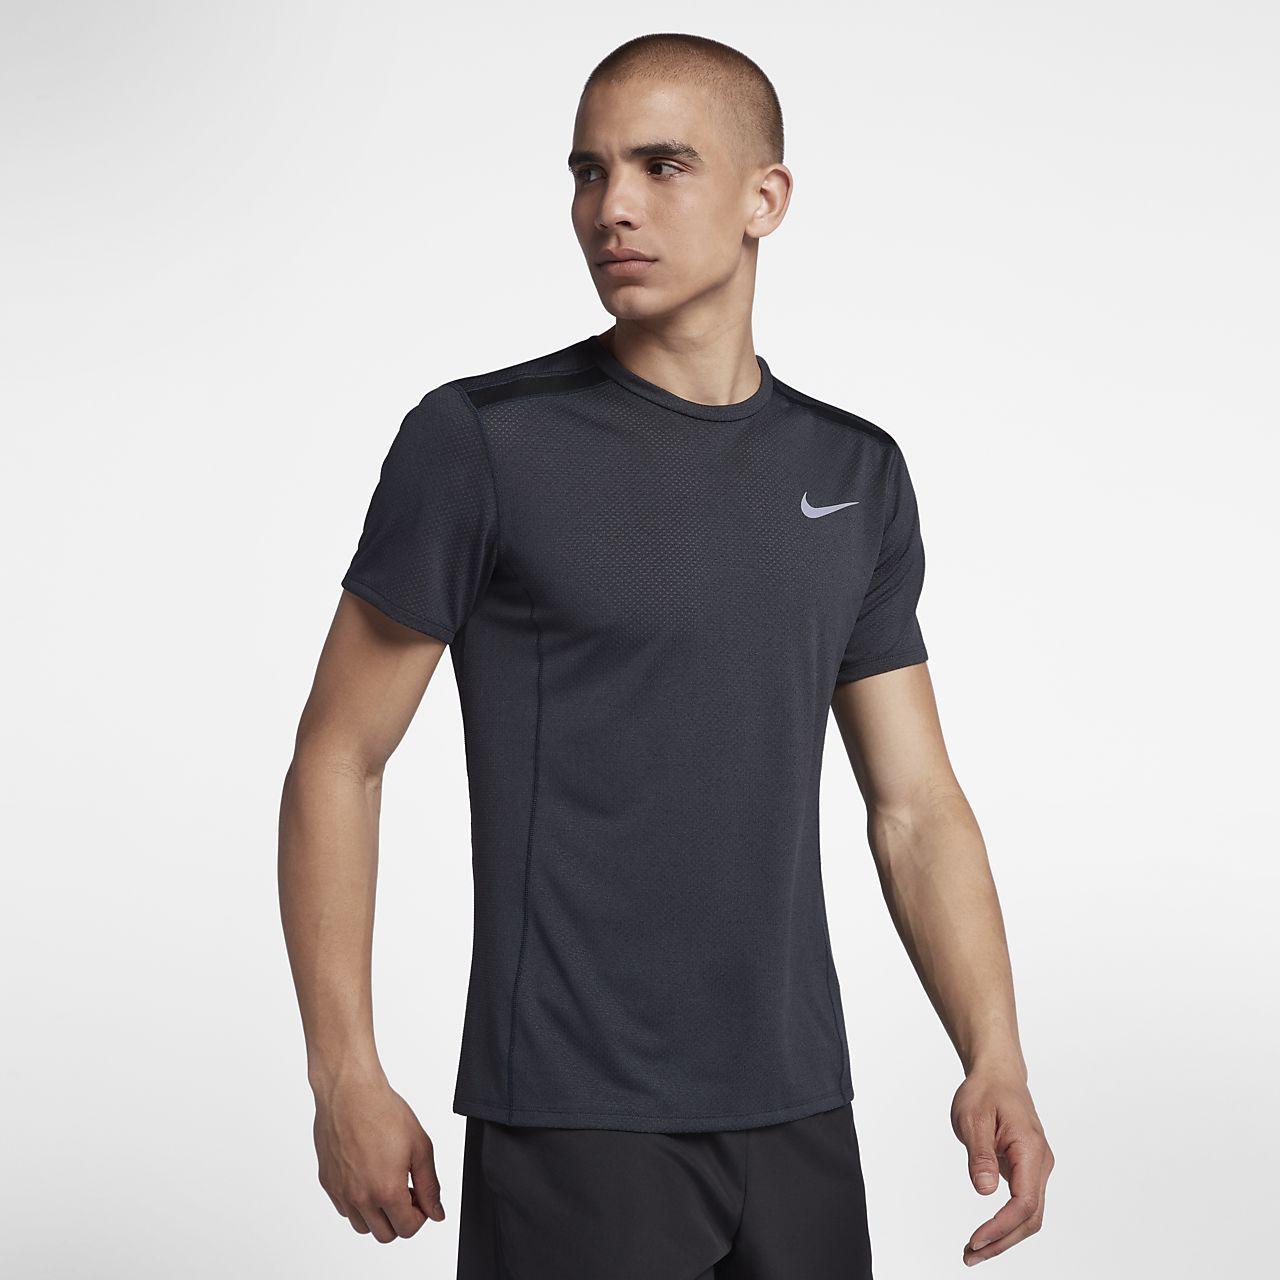 huge discount d8ae3 a8484 Nike Miler Short Sleeve T Shirt Mens